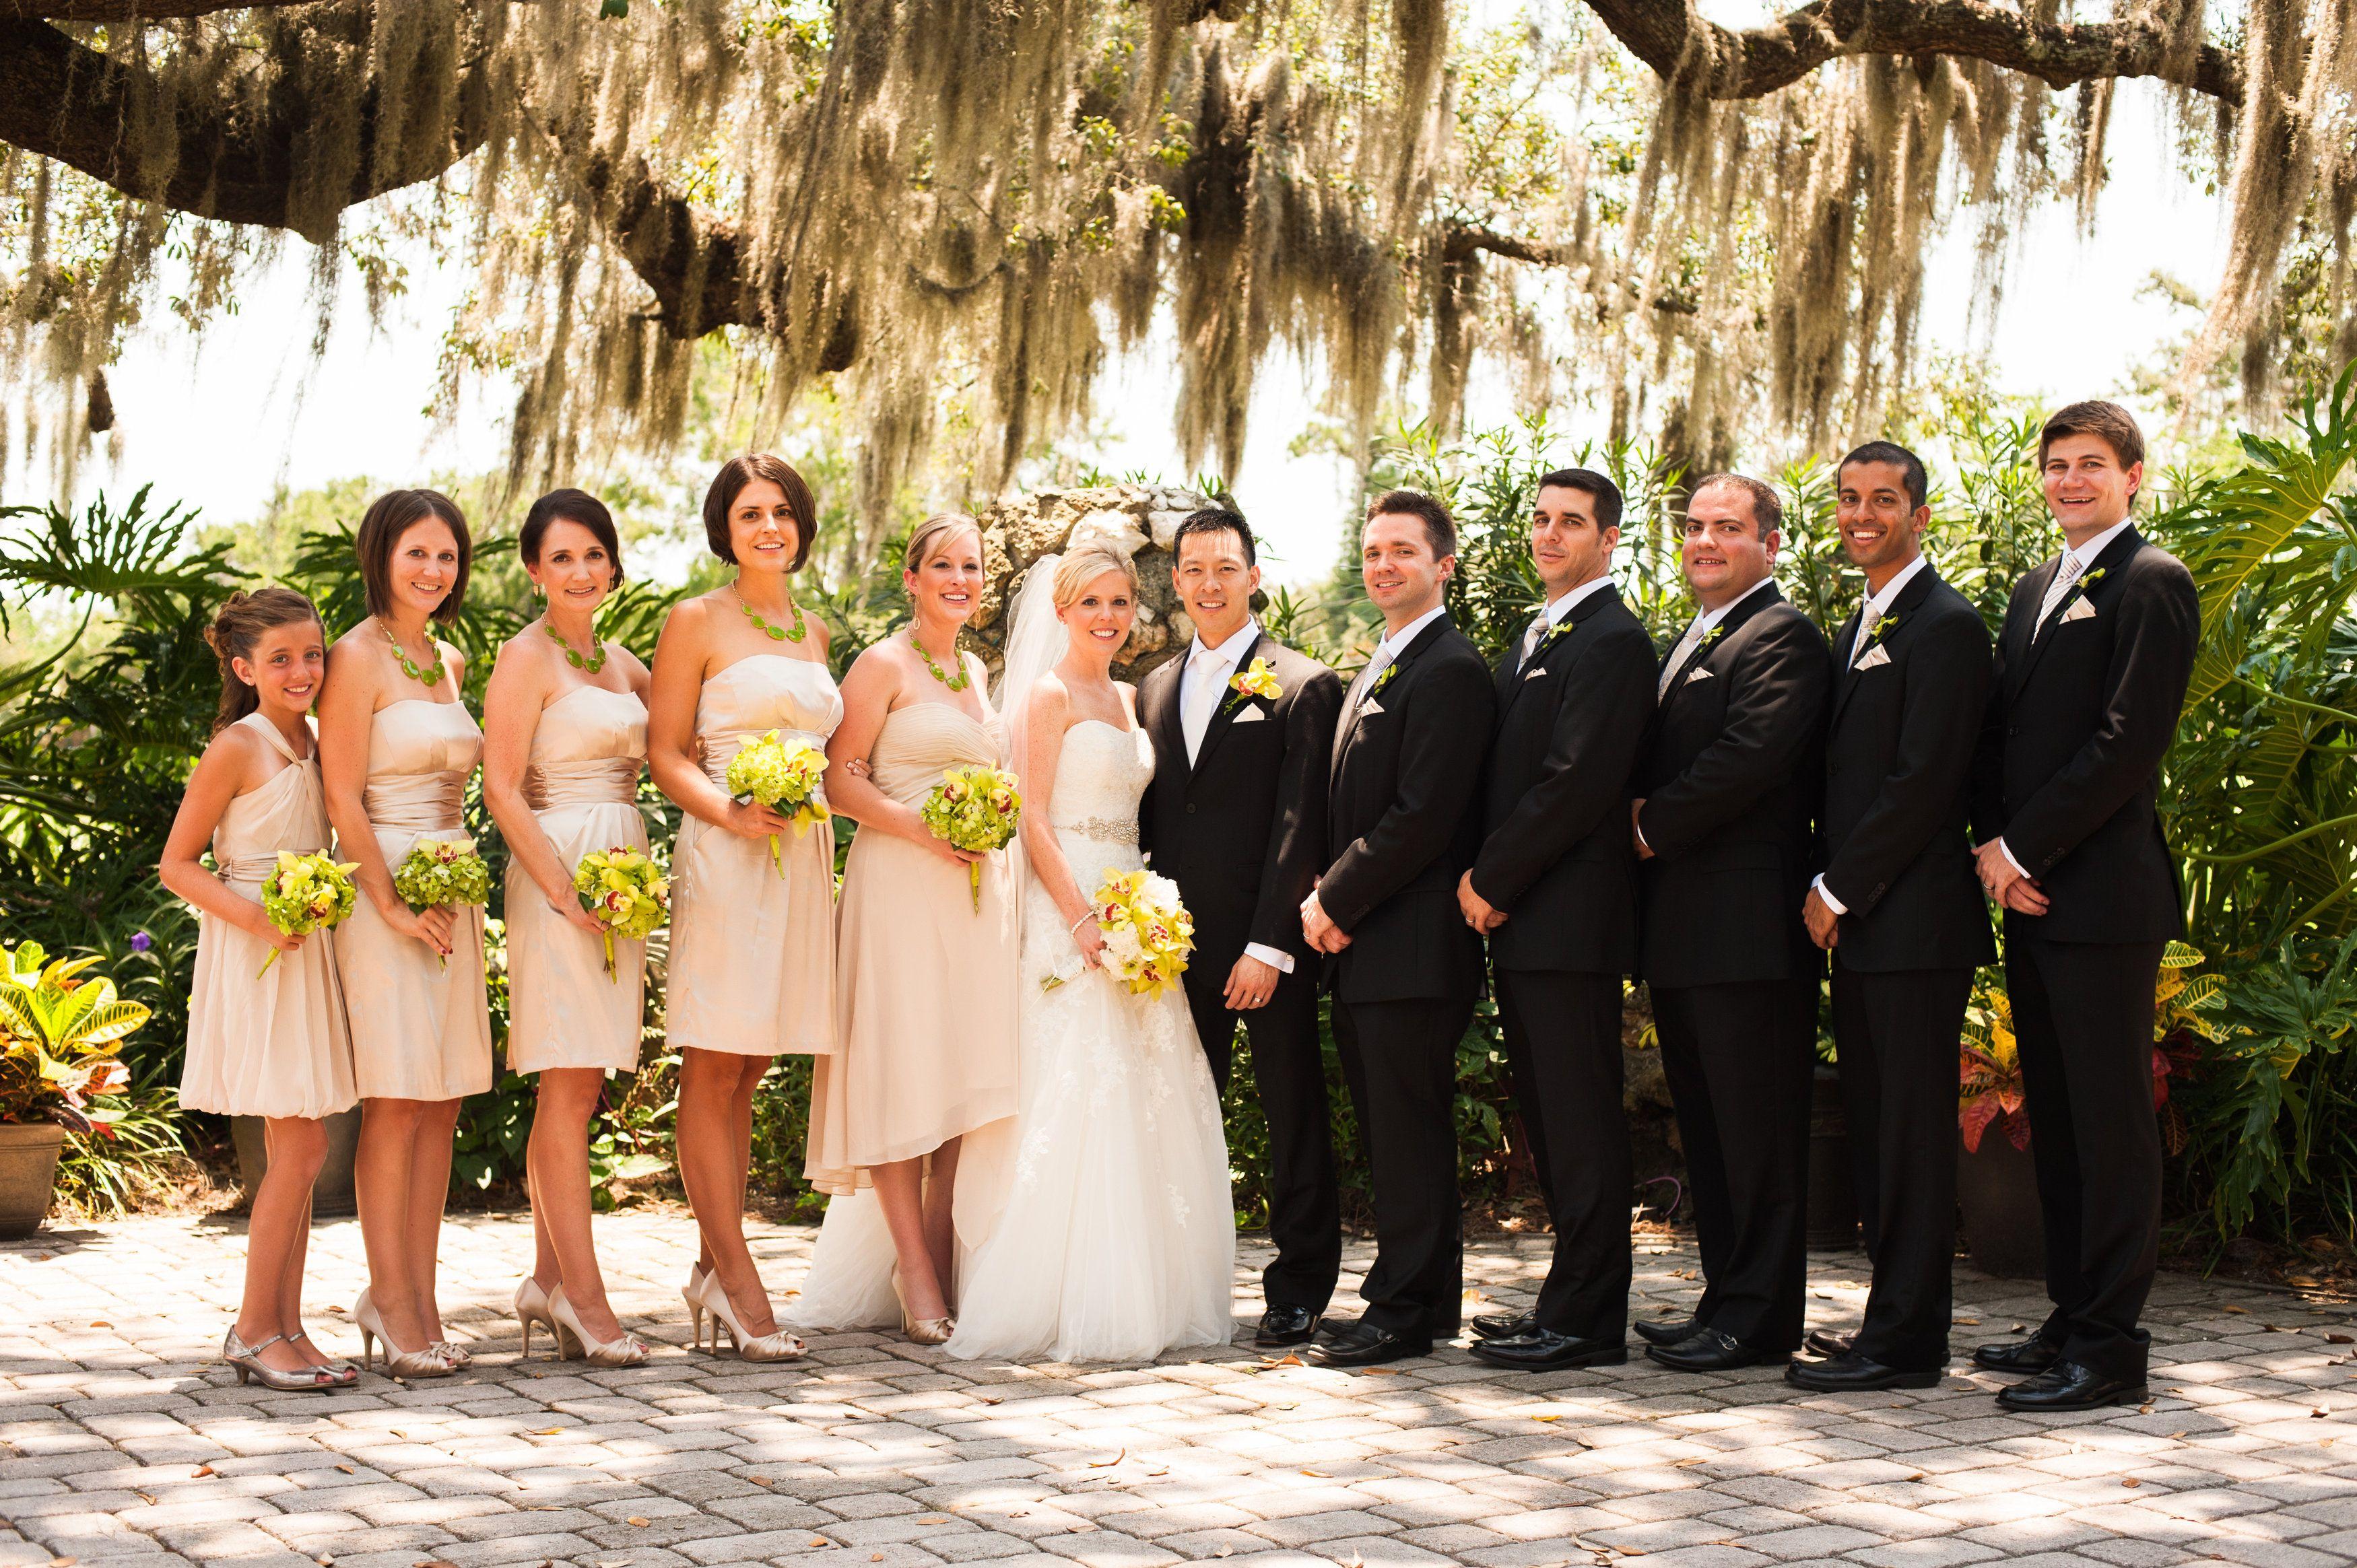 Ipw Reception Corporate Event Photographyorlando Wedding: Orlando Wedding Photography